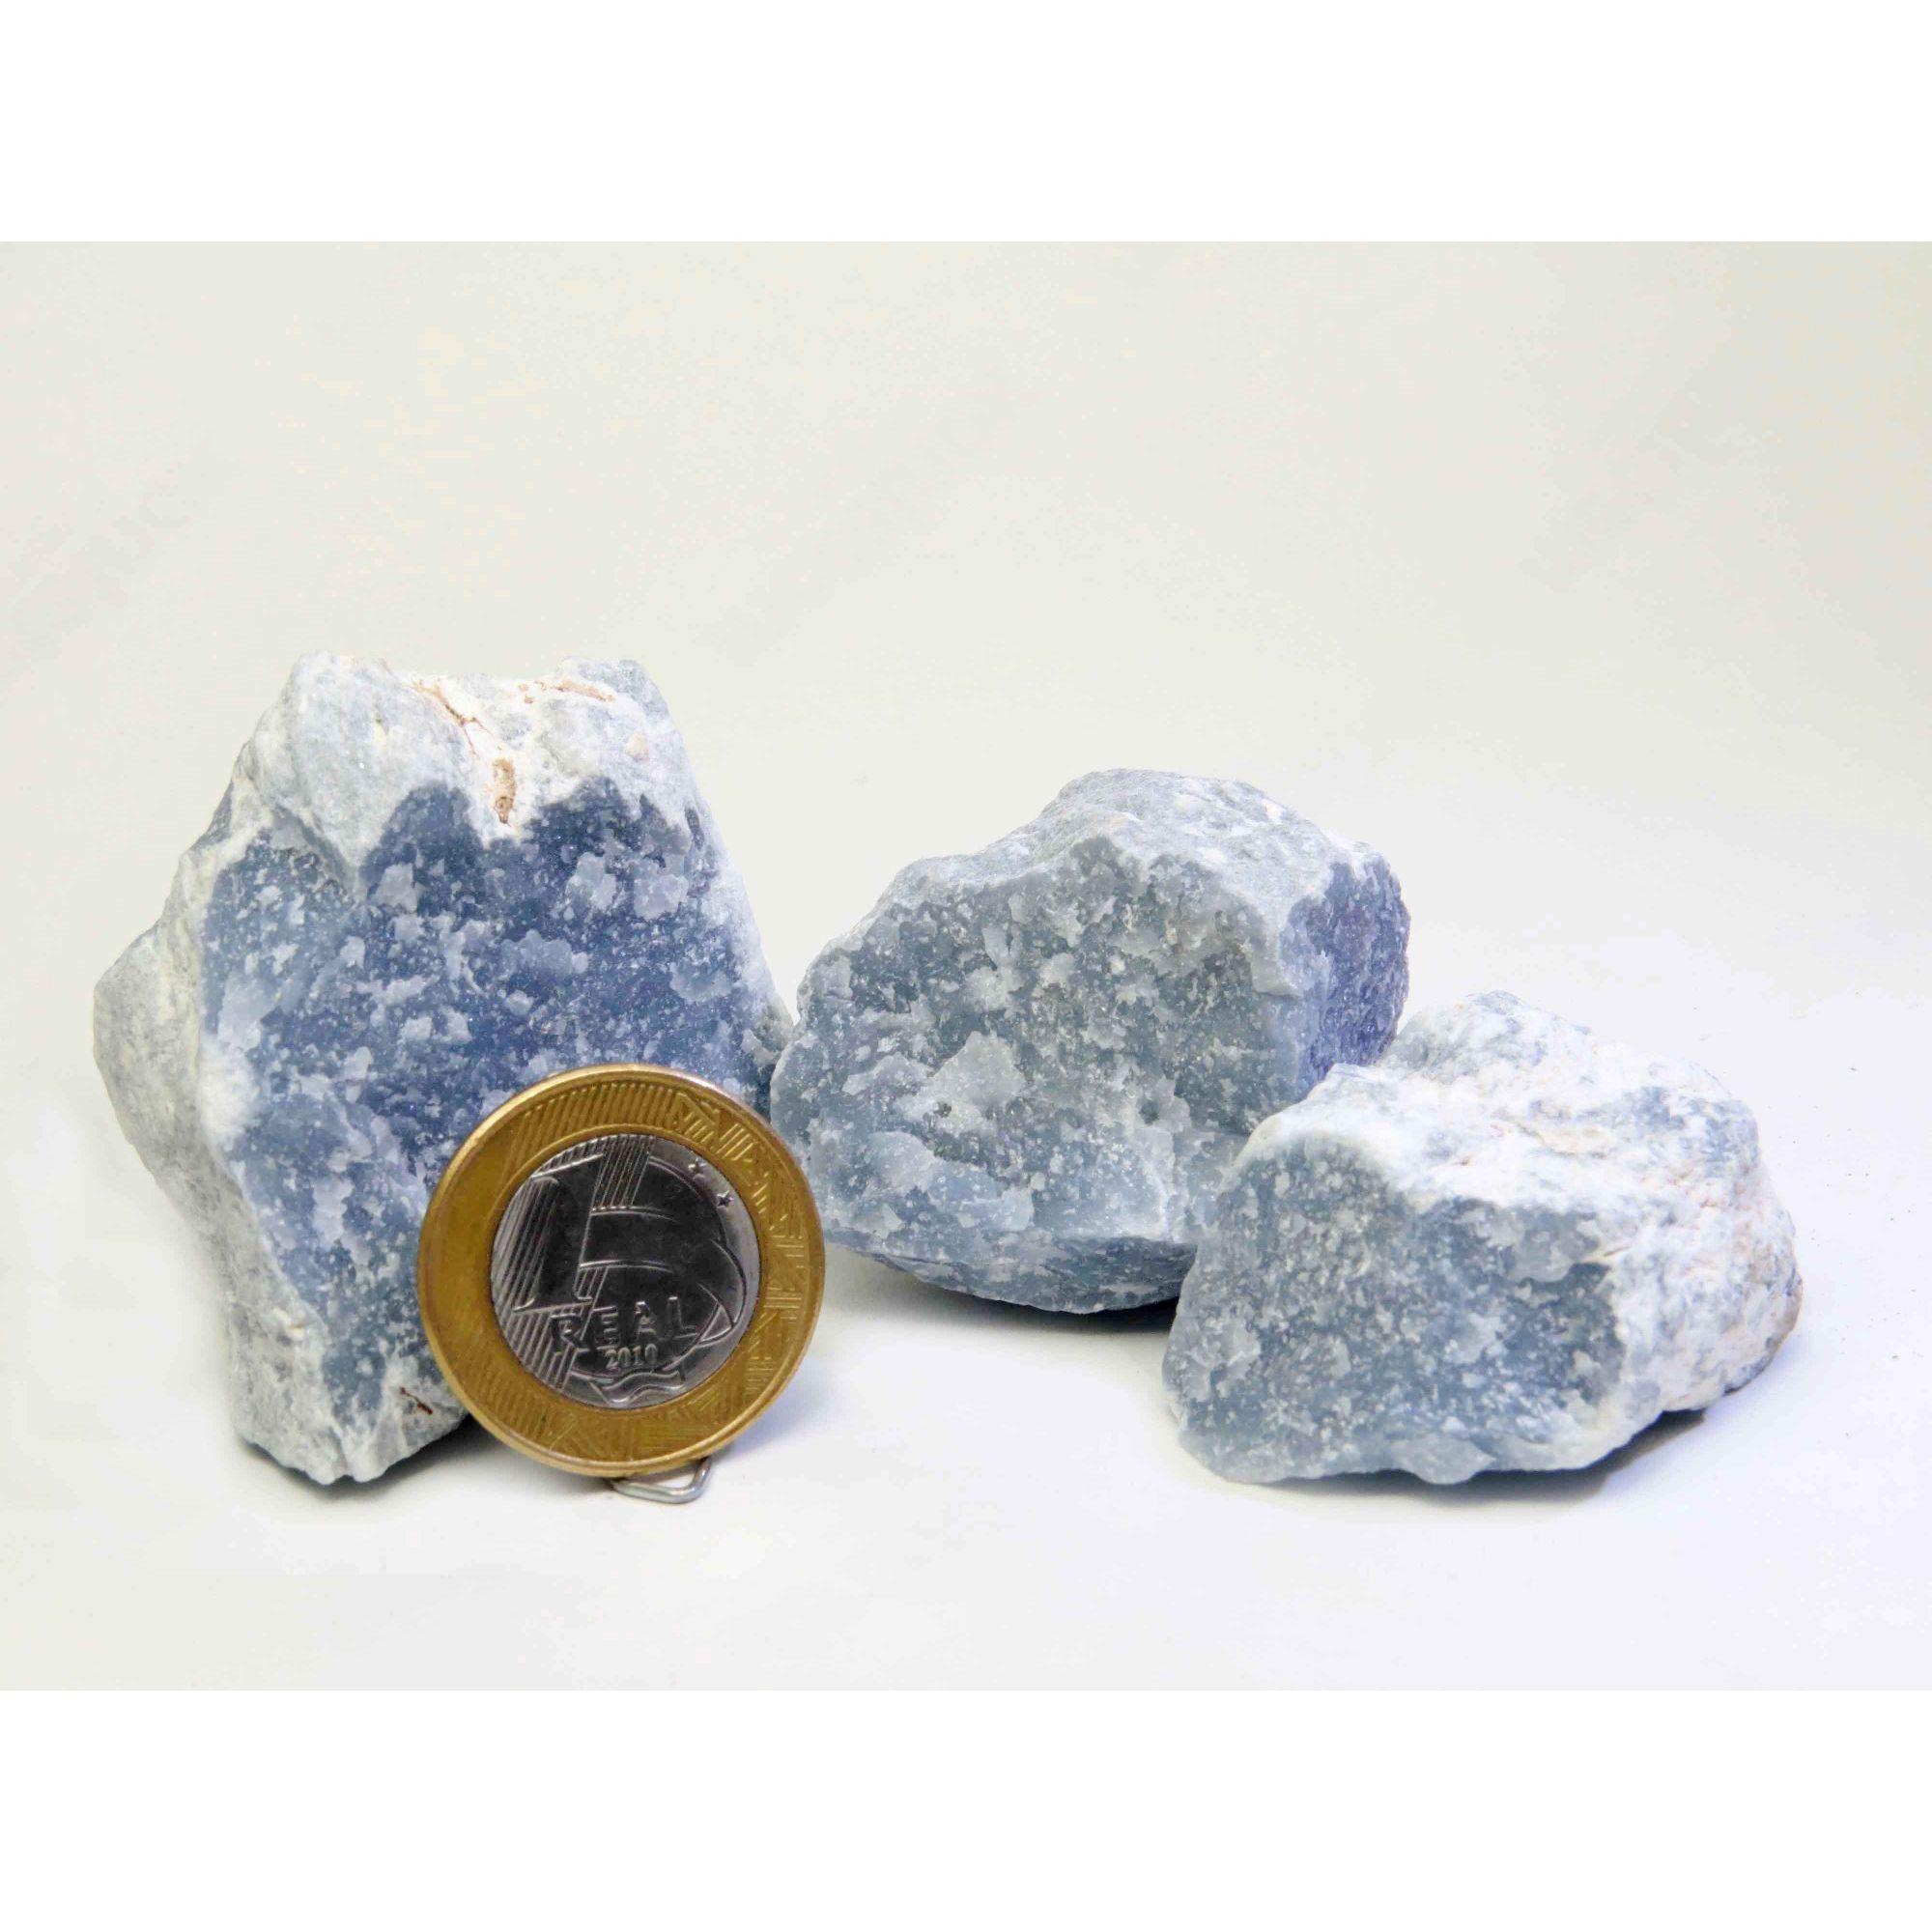 Angelita - Bruto - 2,5 a 4 cm